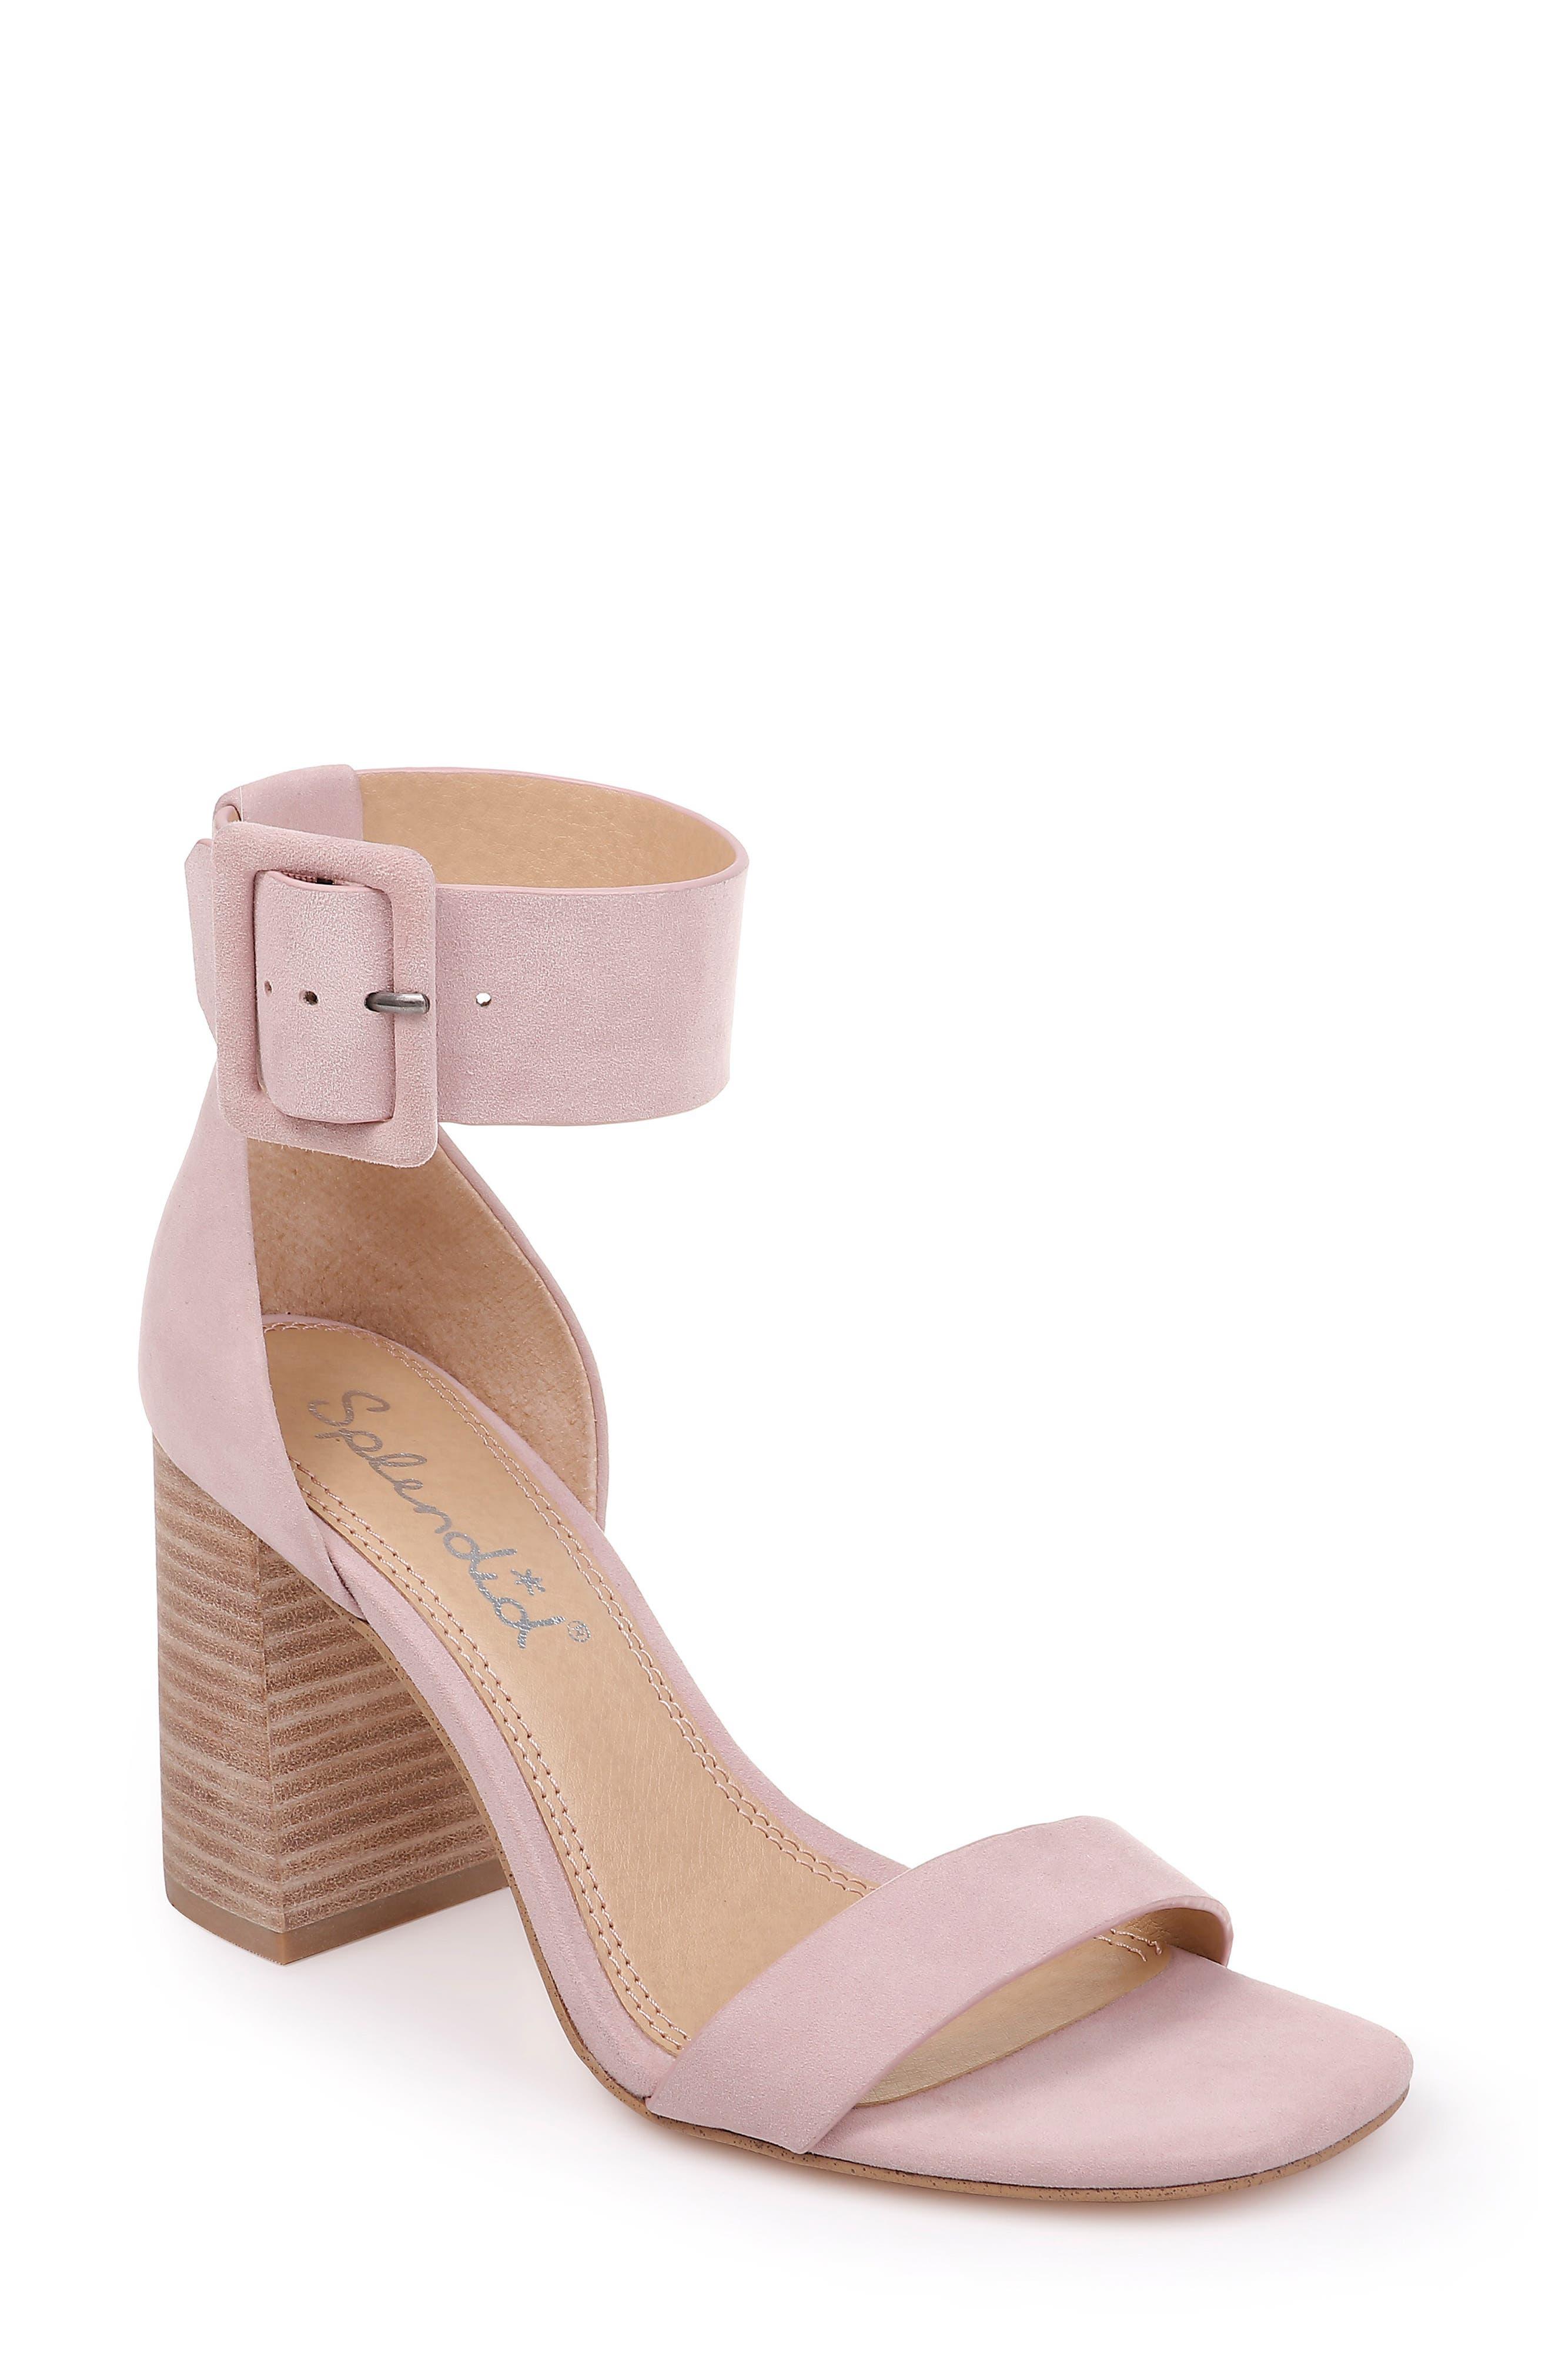 Splendid Block Heel Sandal- Pink